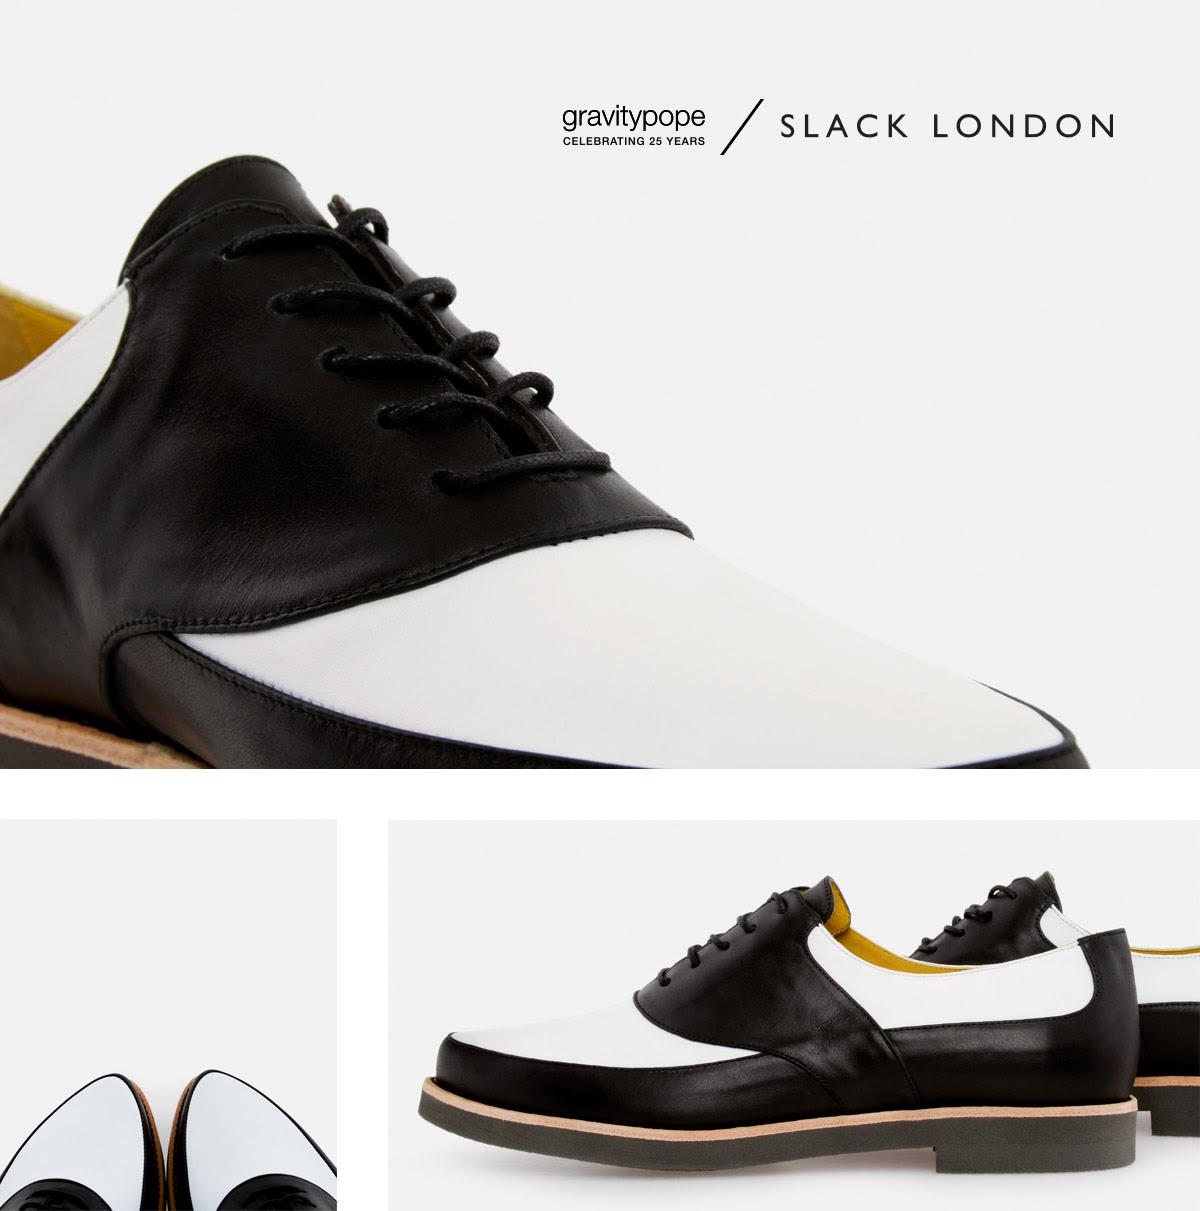 GRAVITYPOPE X SLACK LONDON